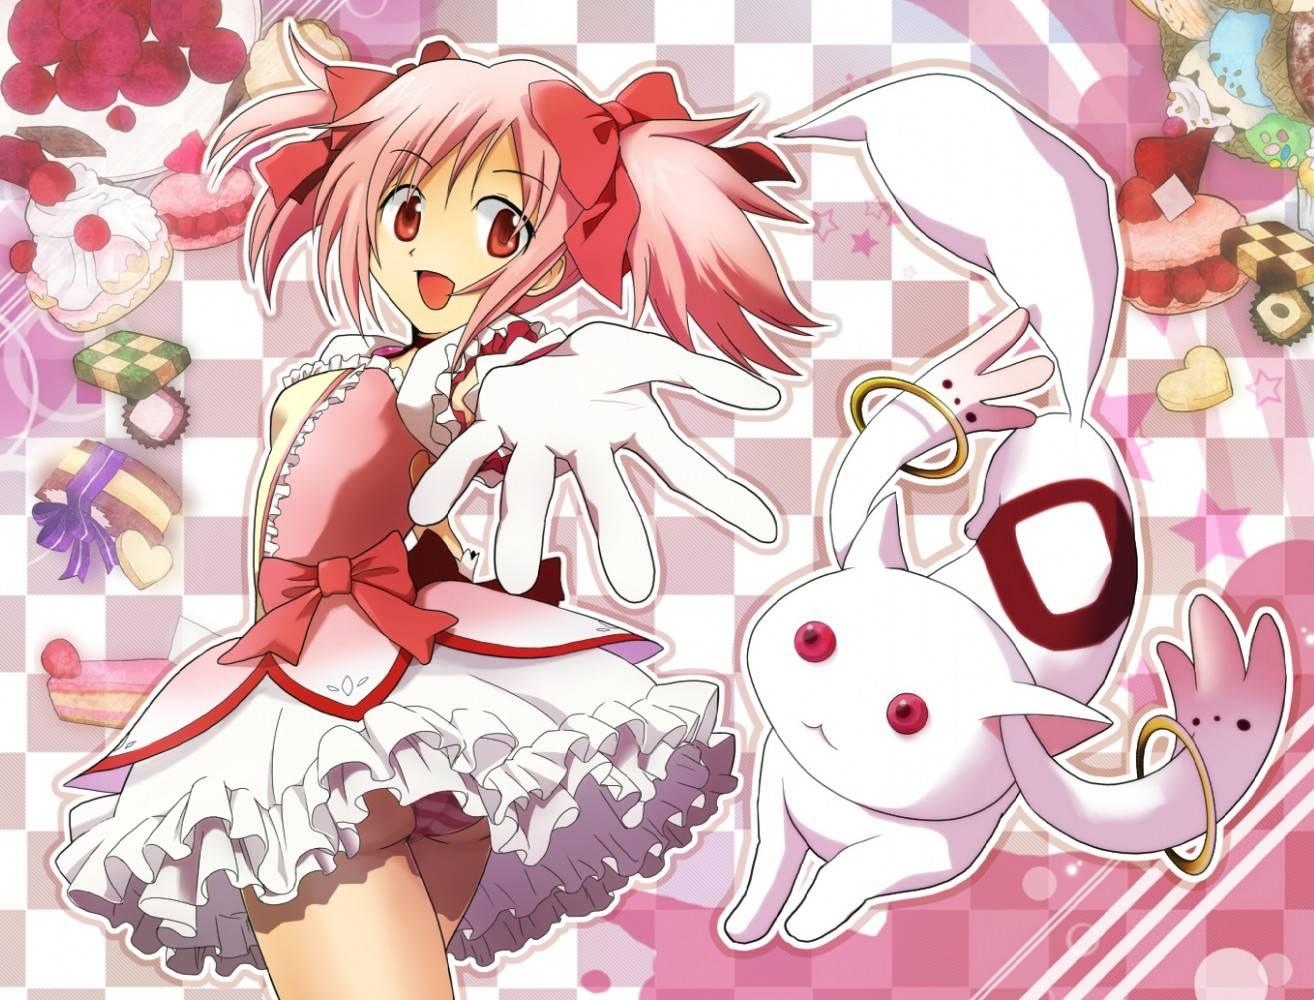 Free Download Madoka Kaname And Kyubey Mahou Shoujo Madoka Magica